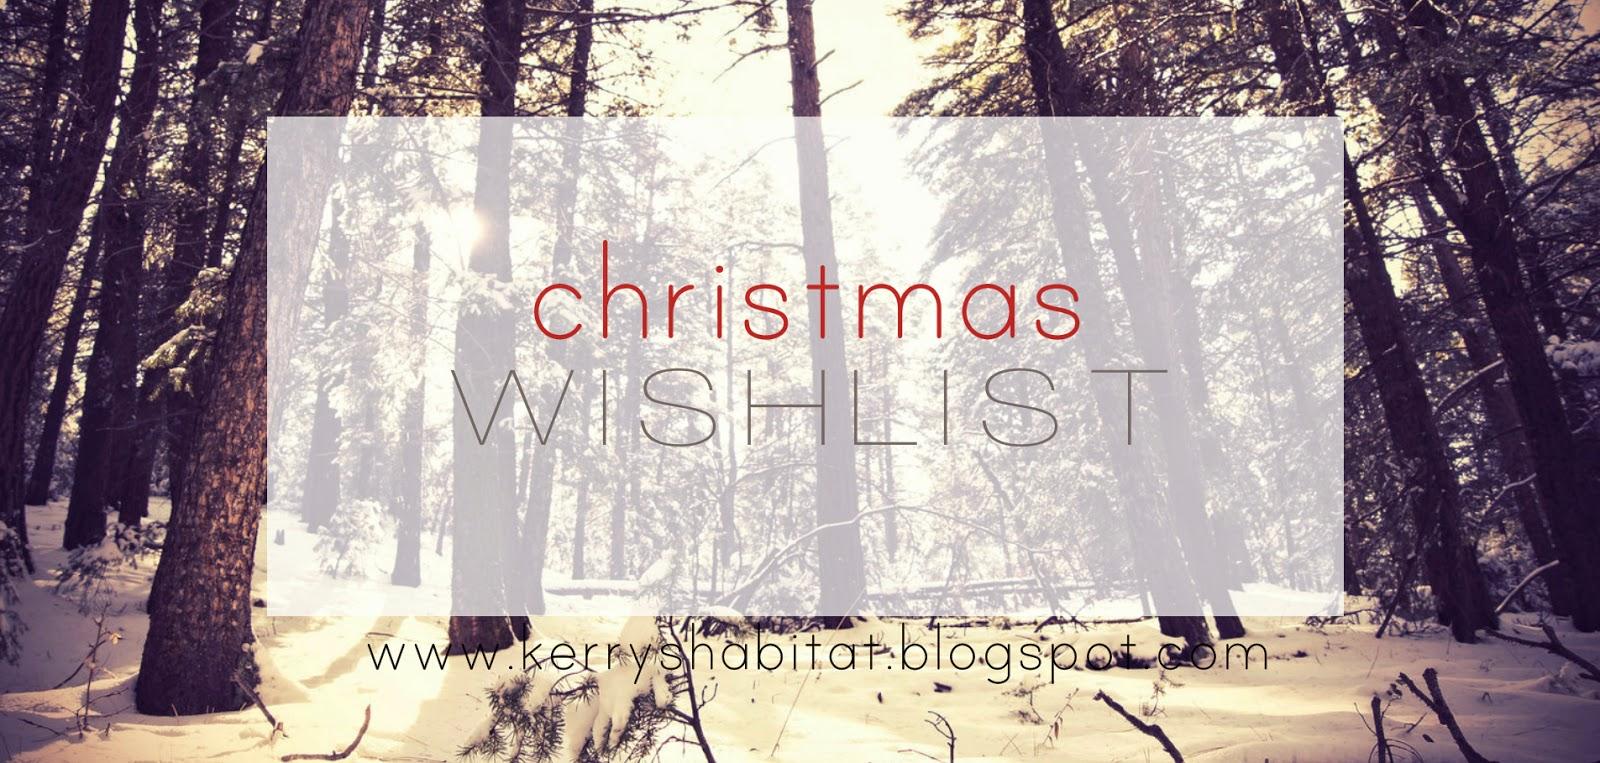 http://kerryshabitat.blogspot.co.uk/2013/11/christmas-wish-list-ultimaterealistic.html